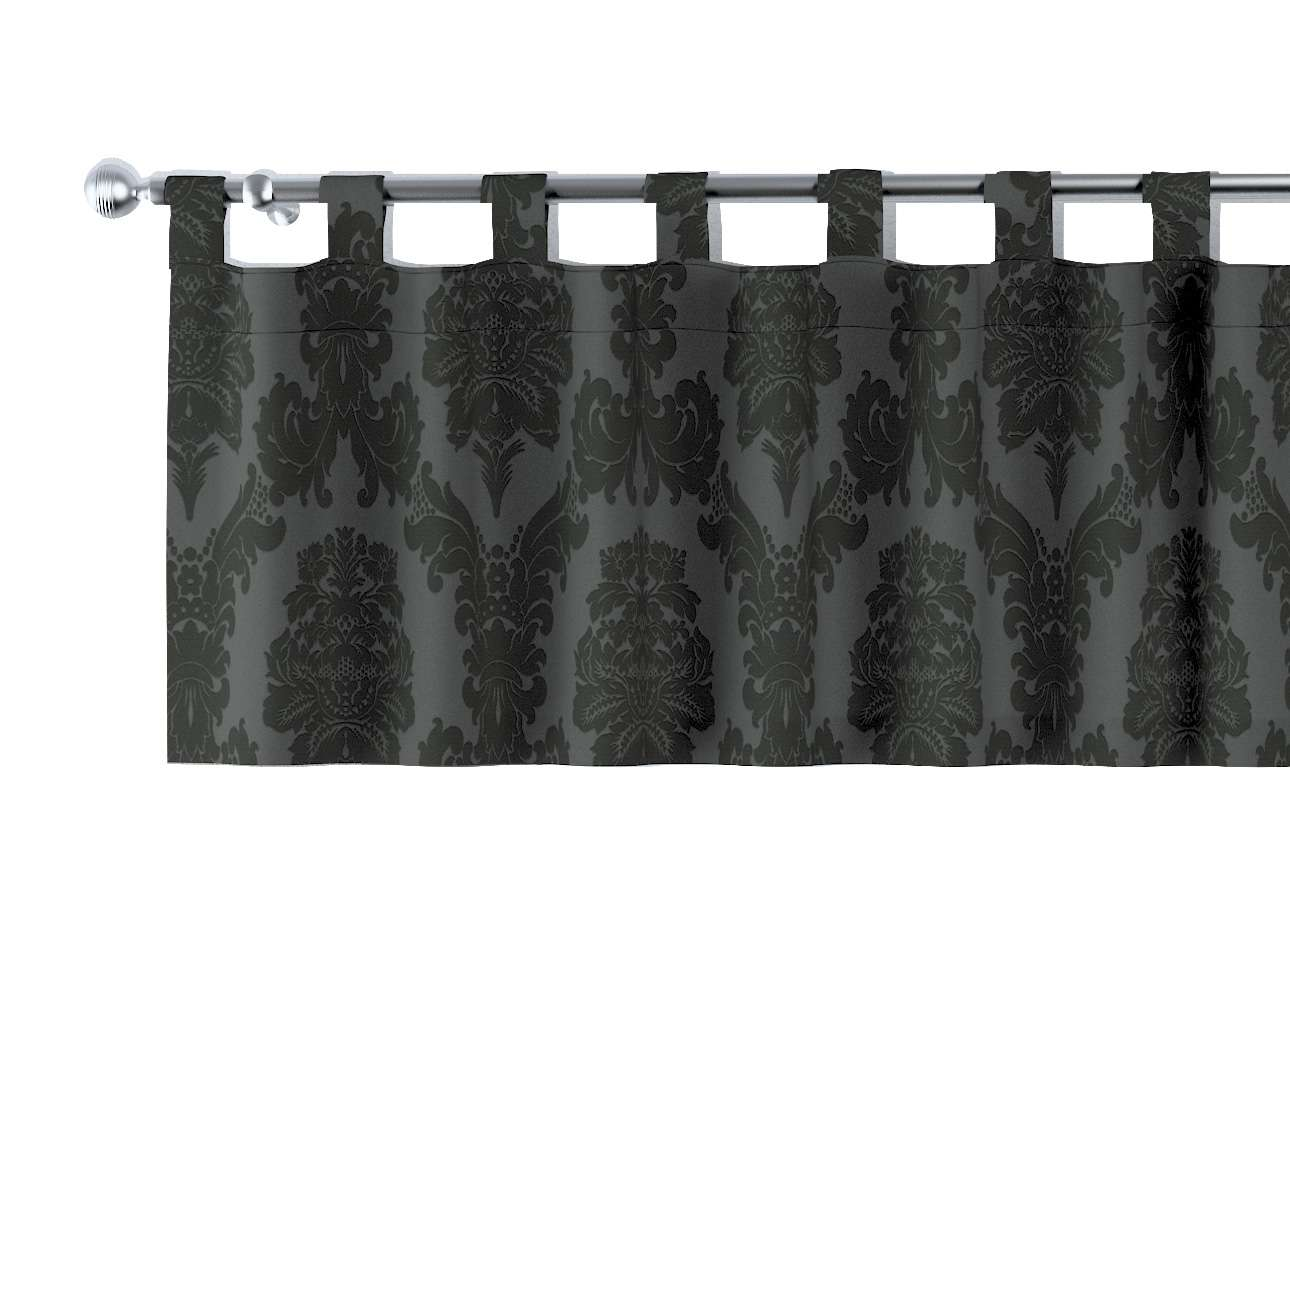 Lambrekin na szelkach 130x40cm w kolekcji Damasco, tkanina: 613-32